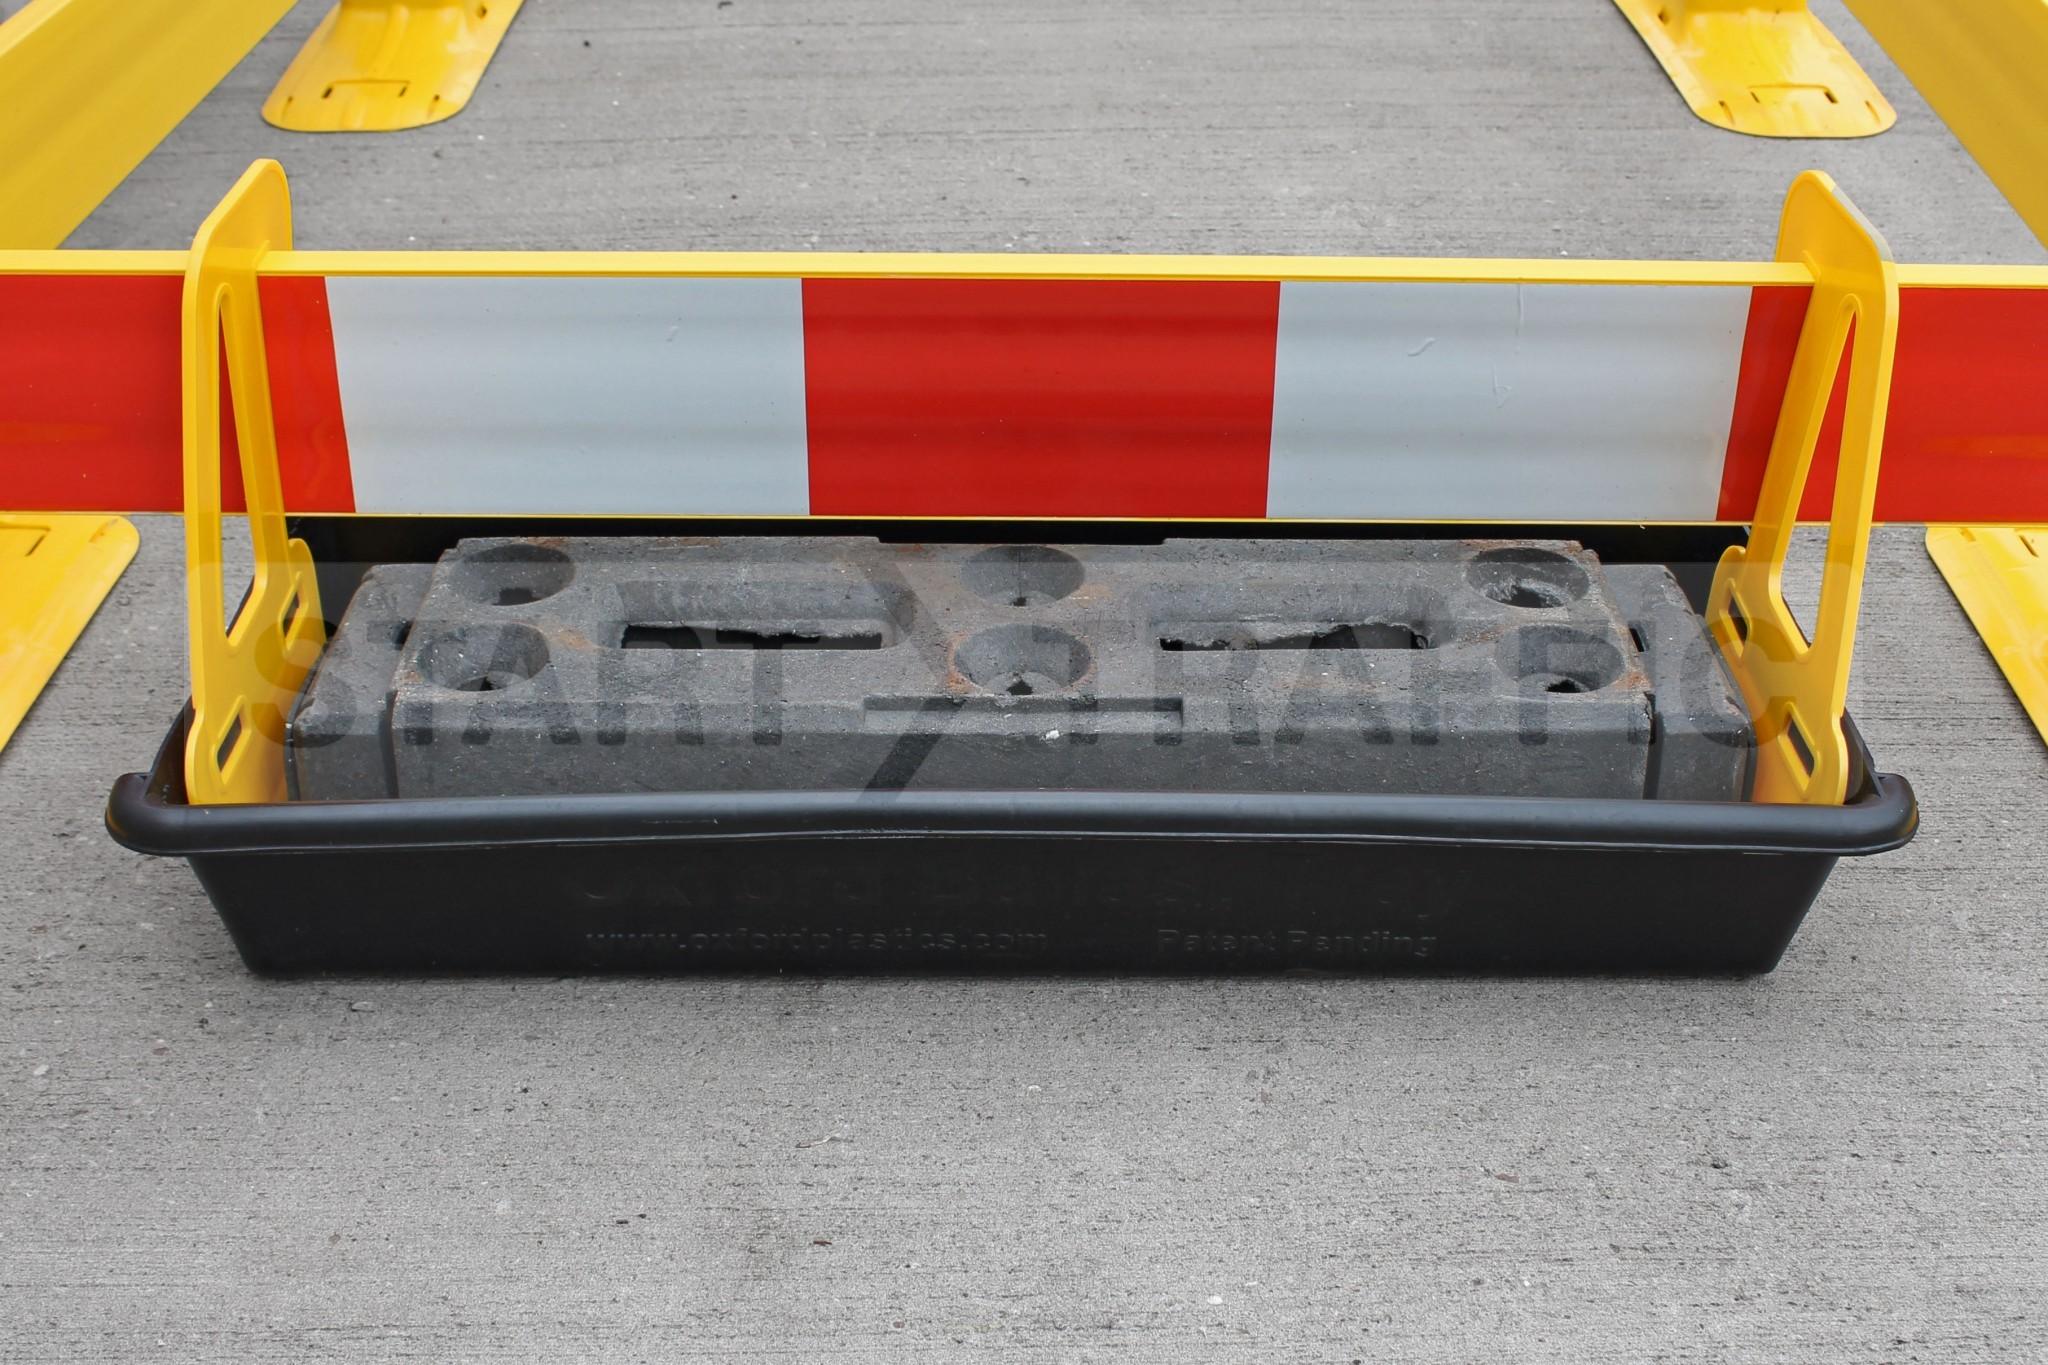 watchman-ballast-tray